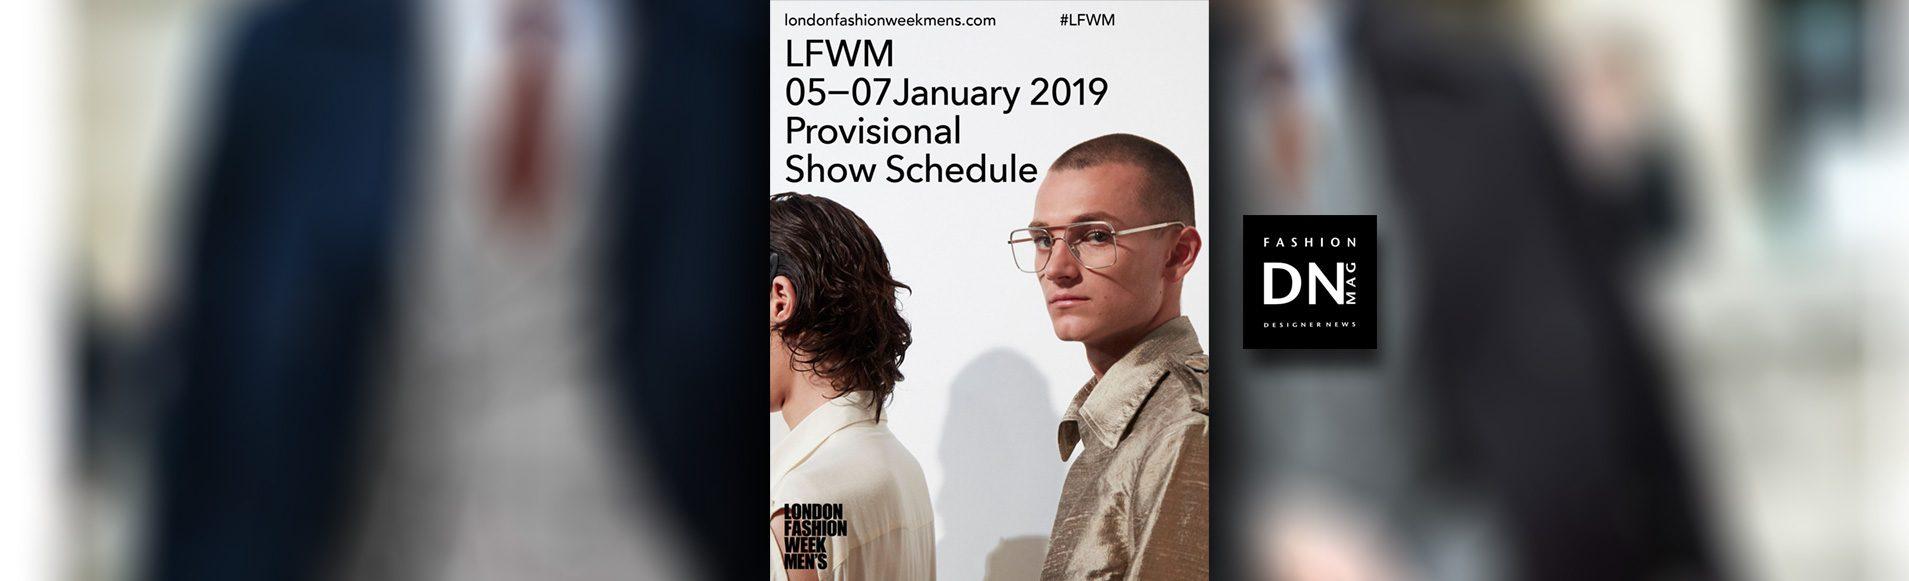 LFWM19-London-Fashion-Week-Men-2019-head